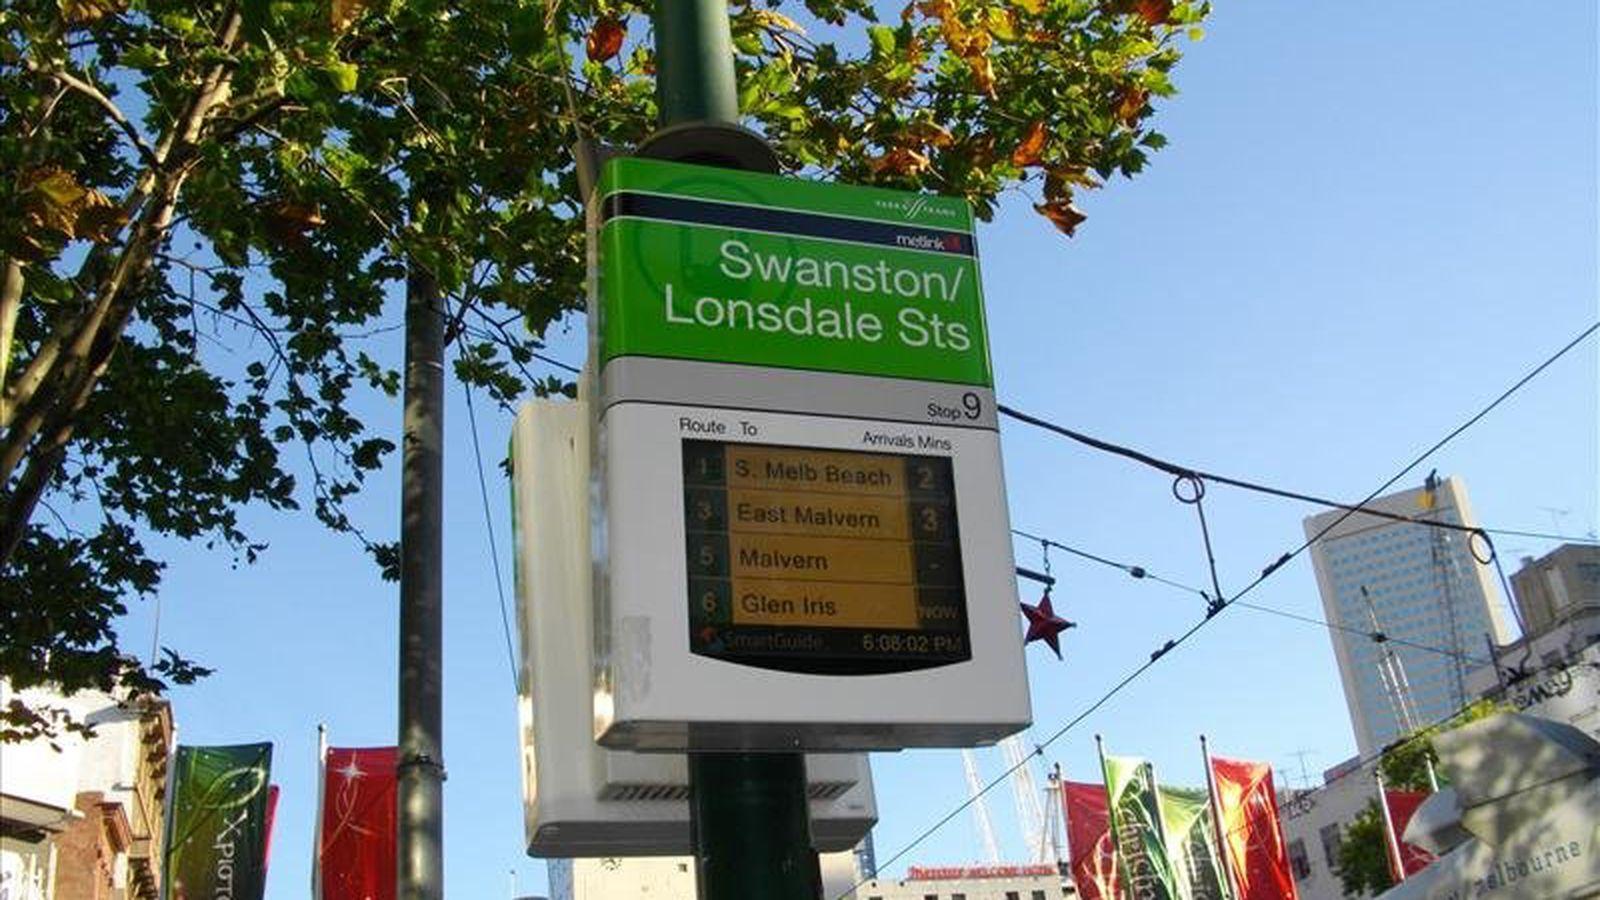 804 / 300 Swanston Street, Melbourne